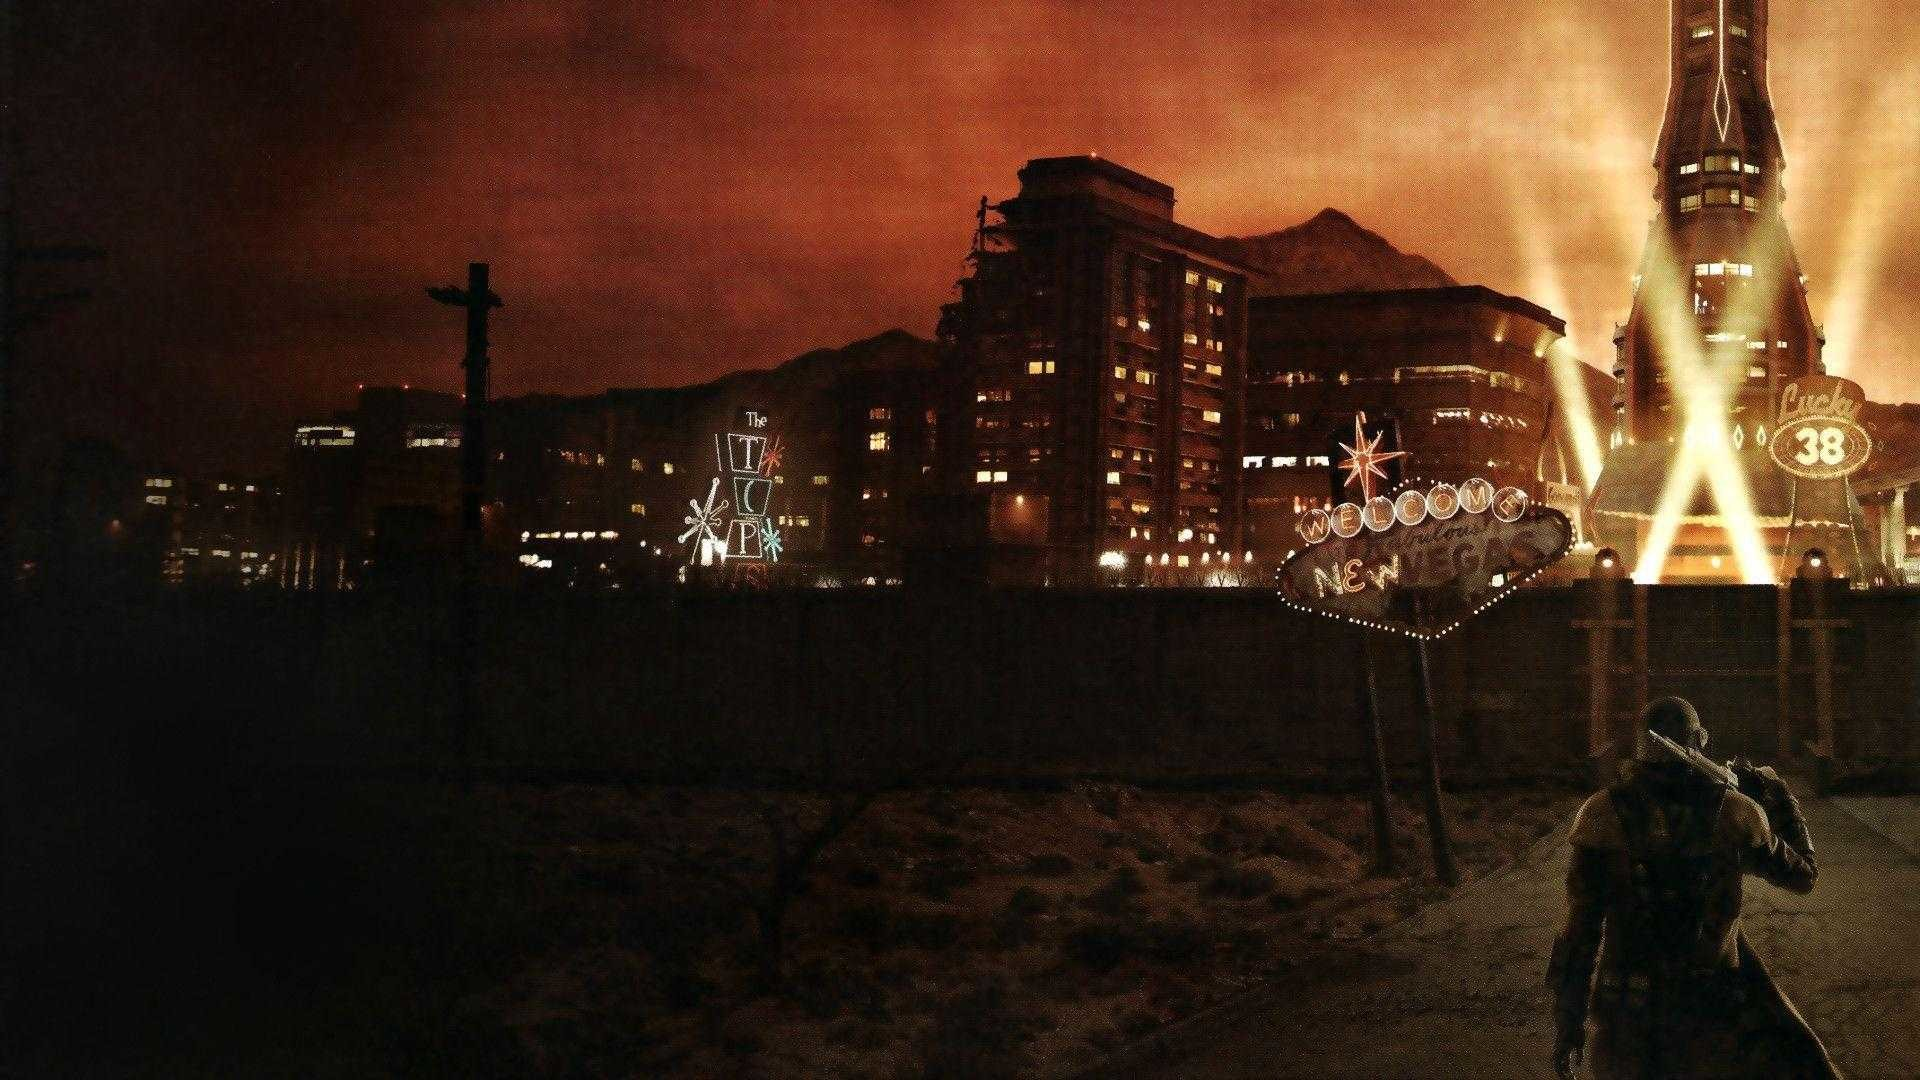 Res: 1920x1080, Fallout Wallpaper  Full Hd Pics High Resolution New Vegas Of  Desktop